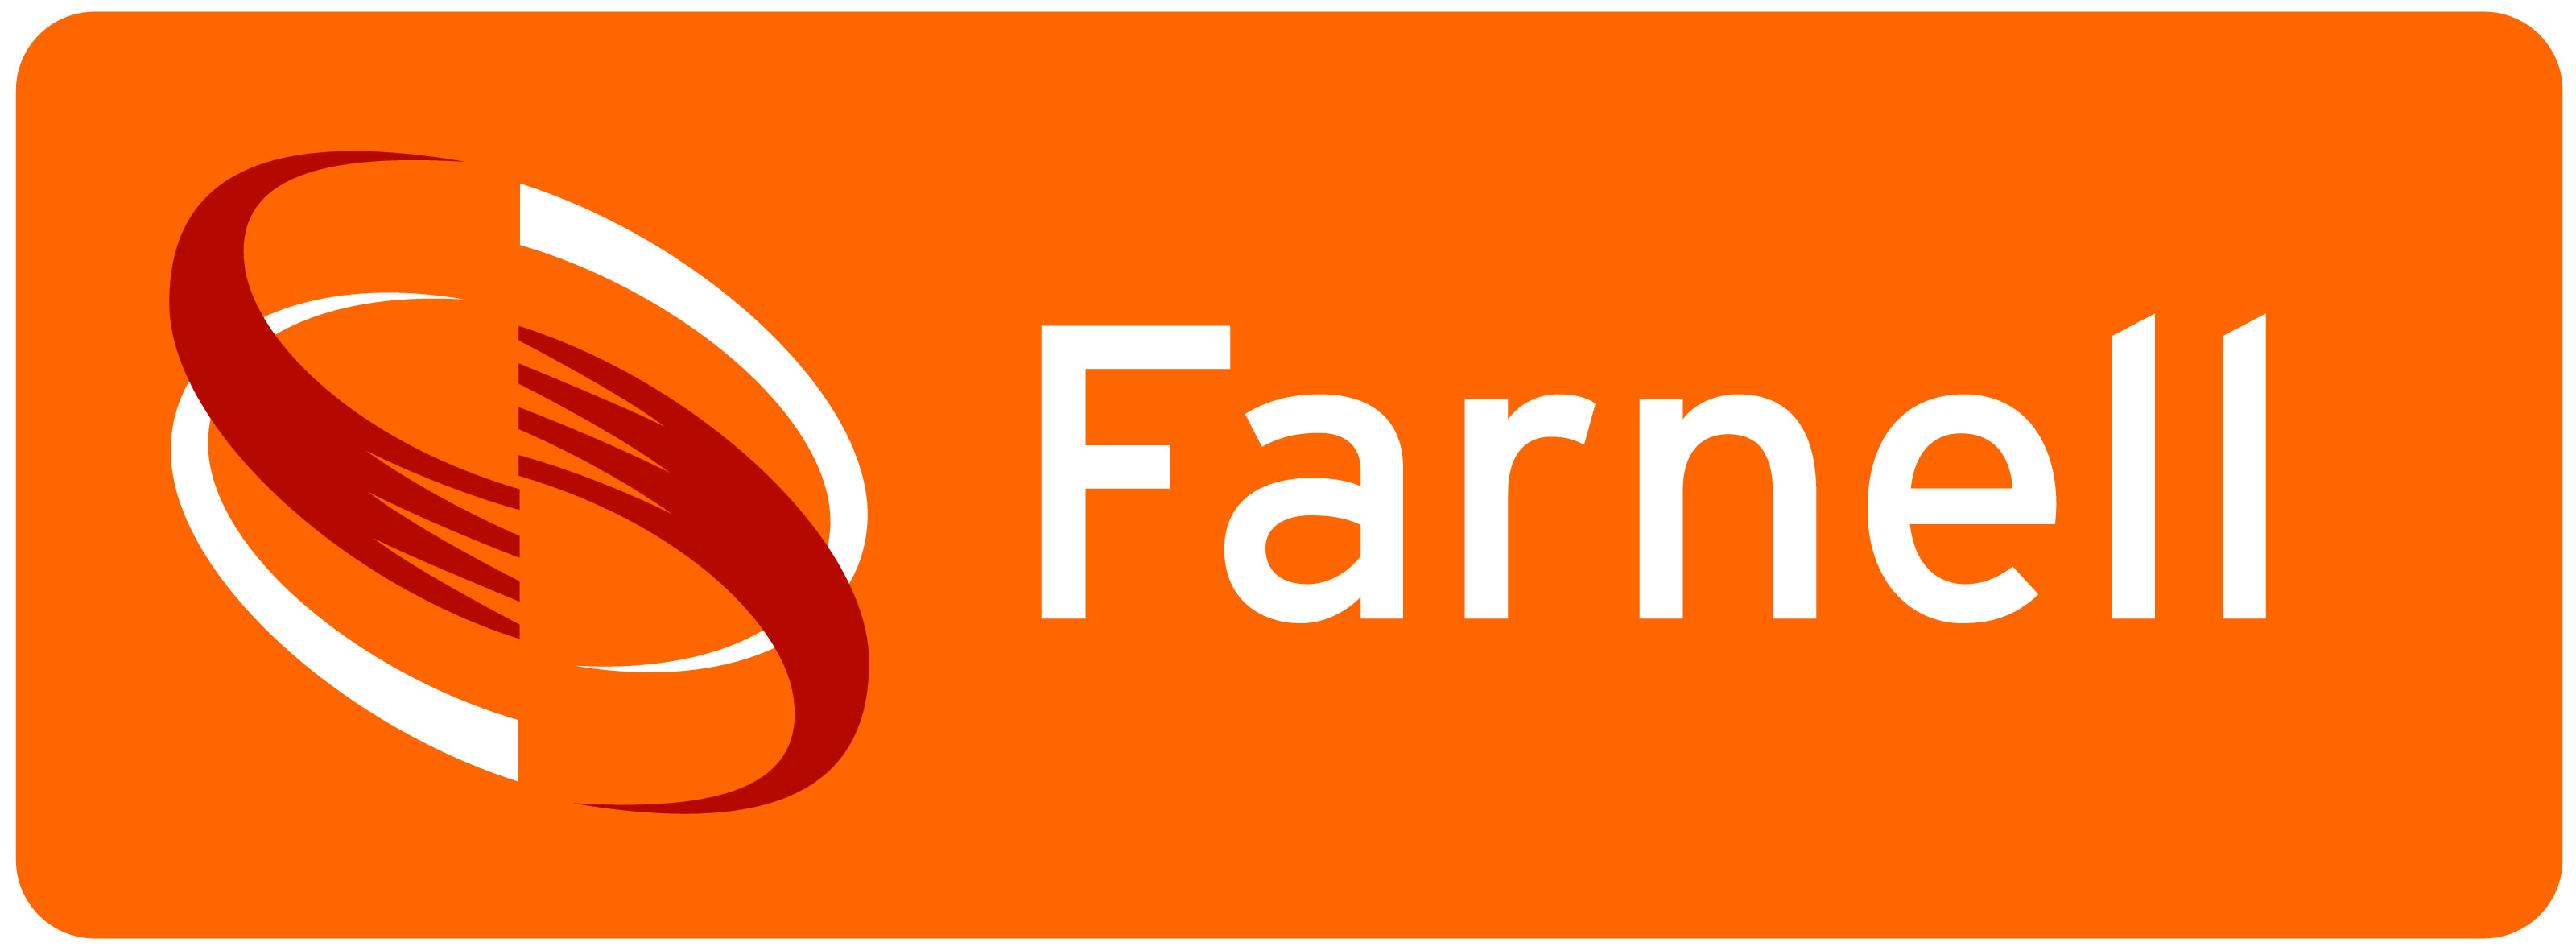 Farnell Logo photo - 1